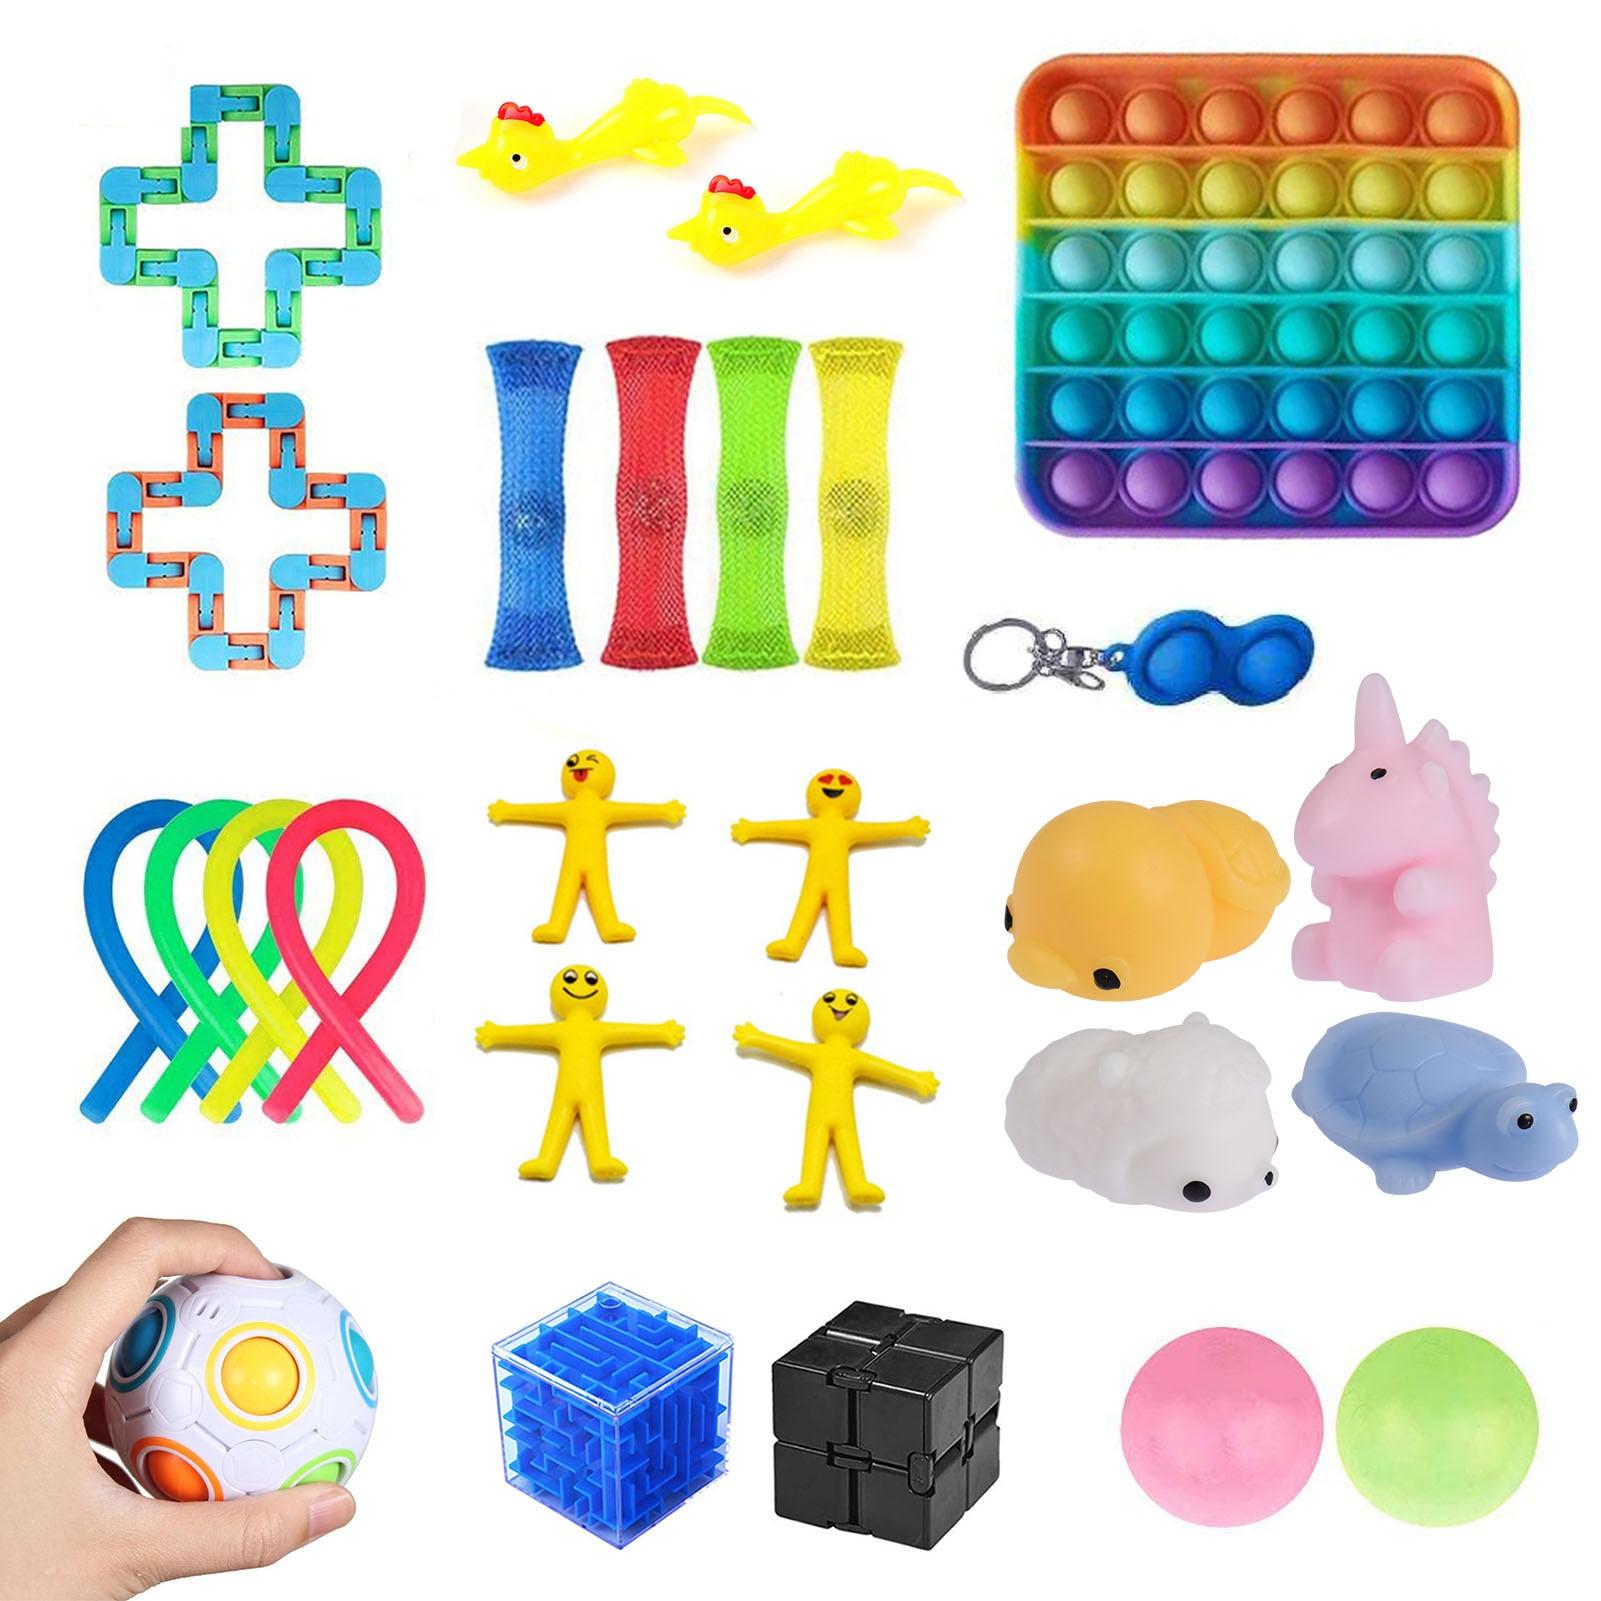 Sensory Fidget Toys Set Stress Relief Anti-Anxiety Sensory Toy Set Wall Stick Ball Stretchy Strings Mesh Marble Anti-stress Toys enlarge